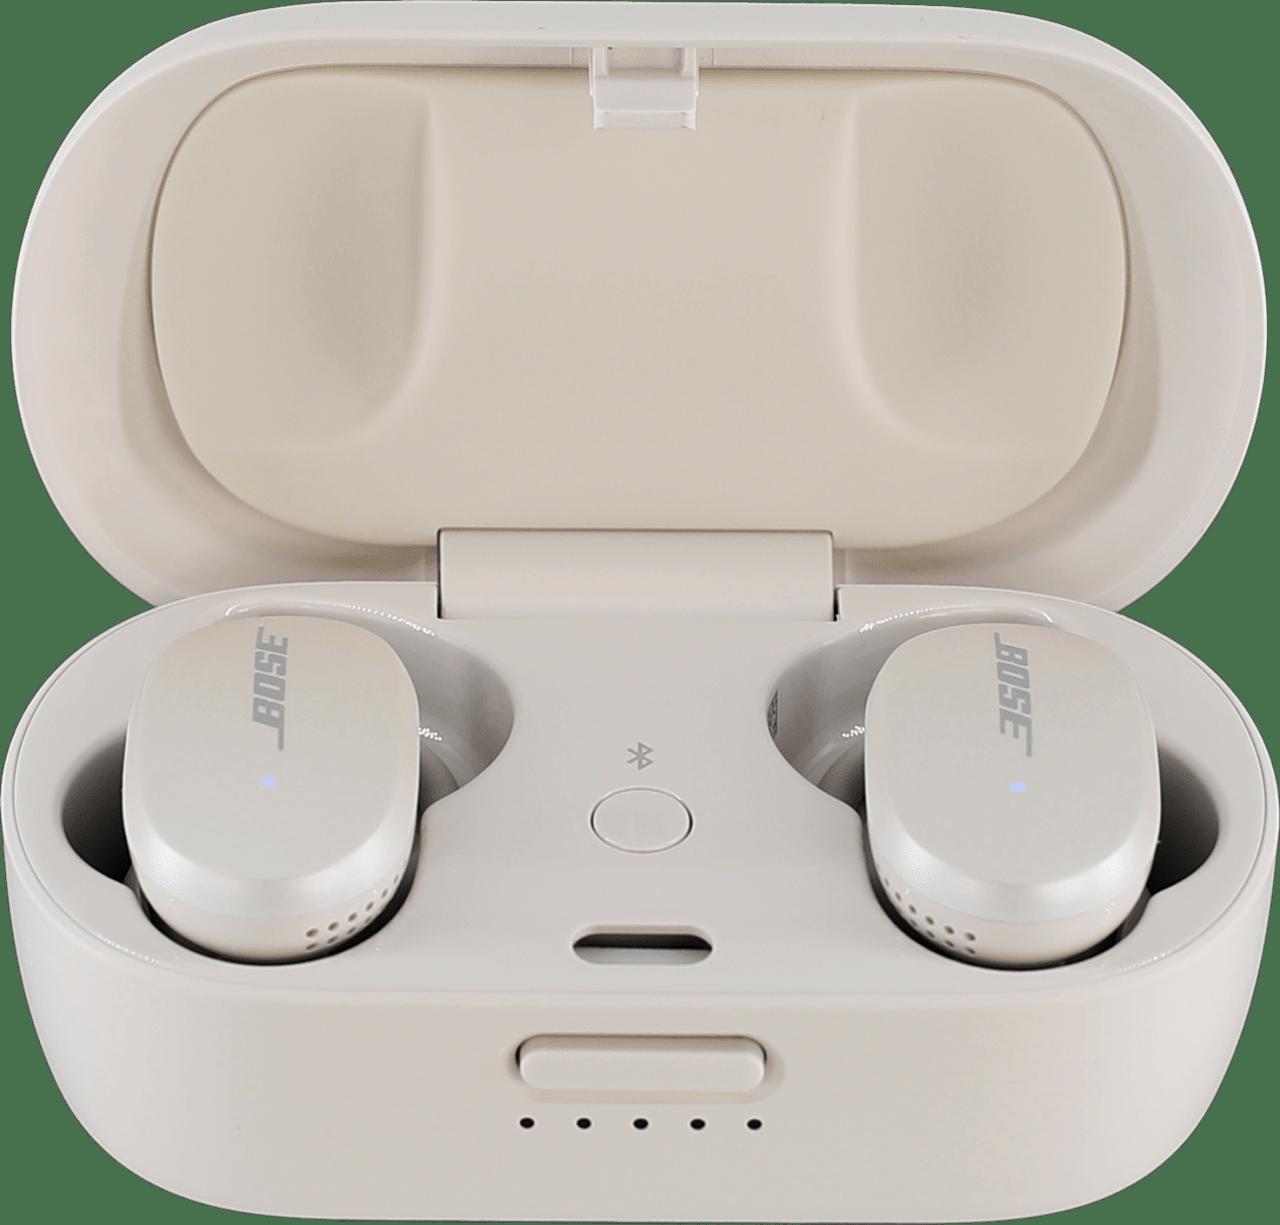 Speckstein Bose QuietComfort Noise-cancelling In-ear Bluetooth-Kopfhörer.3